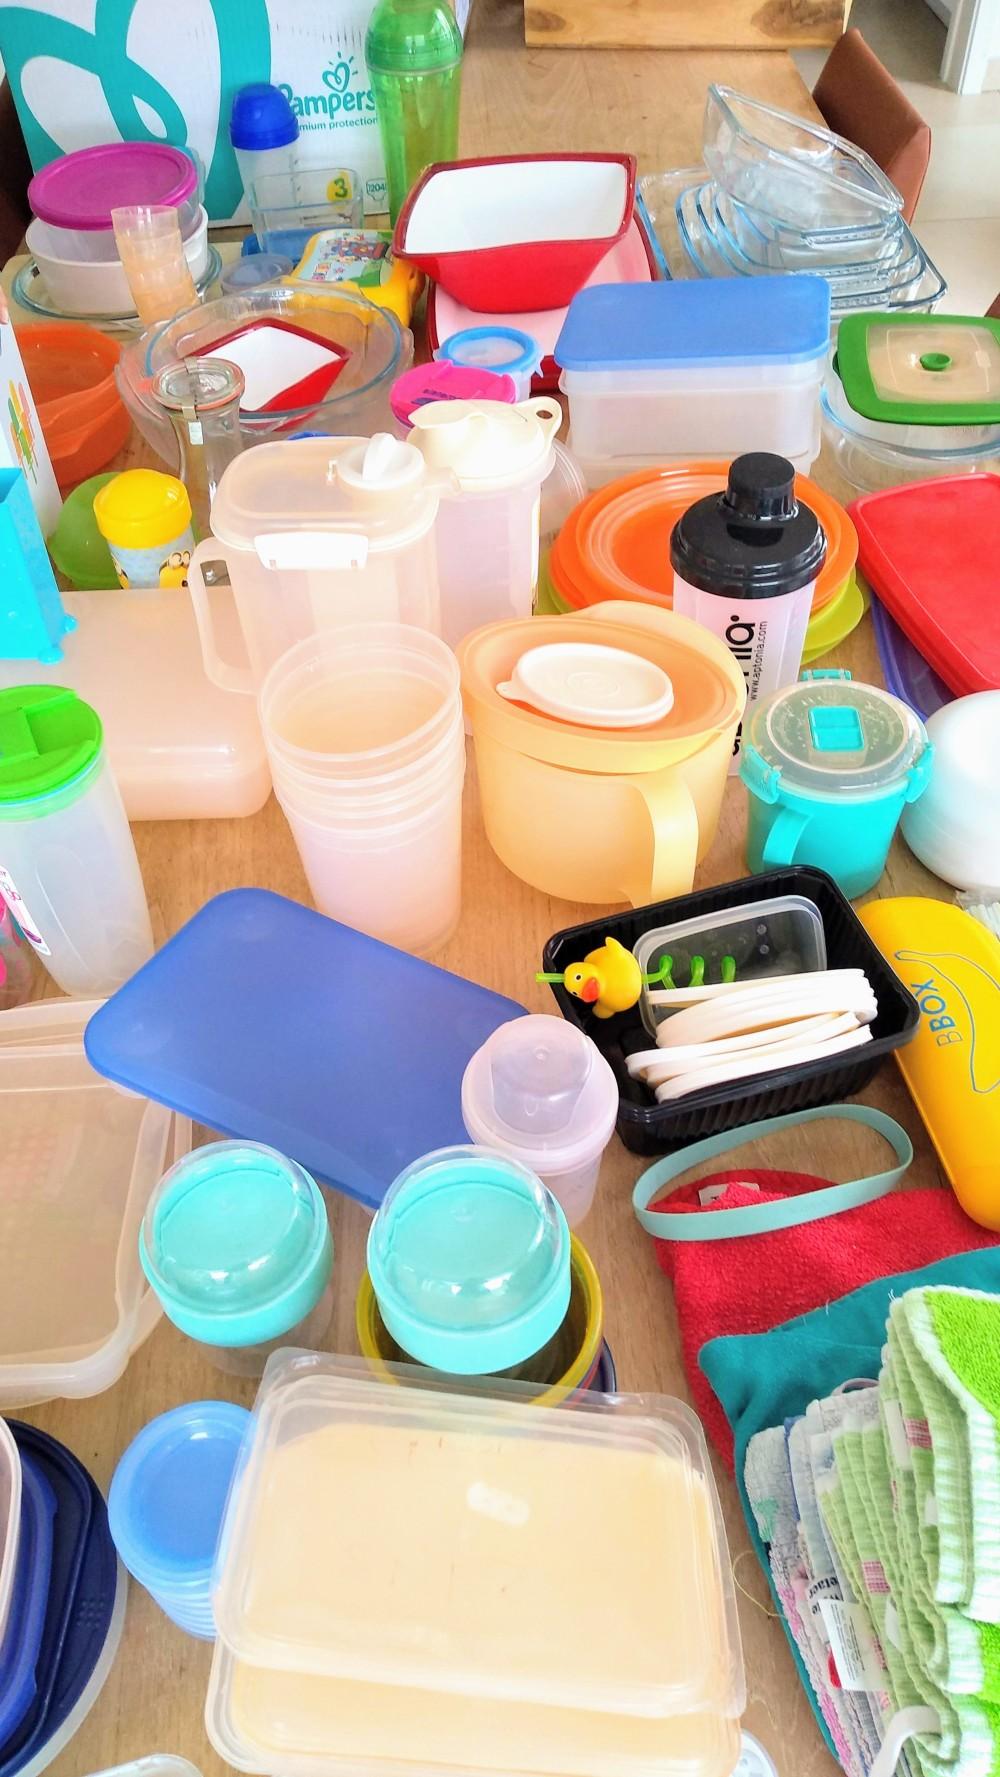 keuken opruimen - opruimcoach - Nele Colle